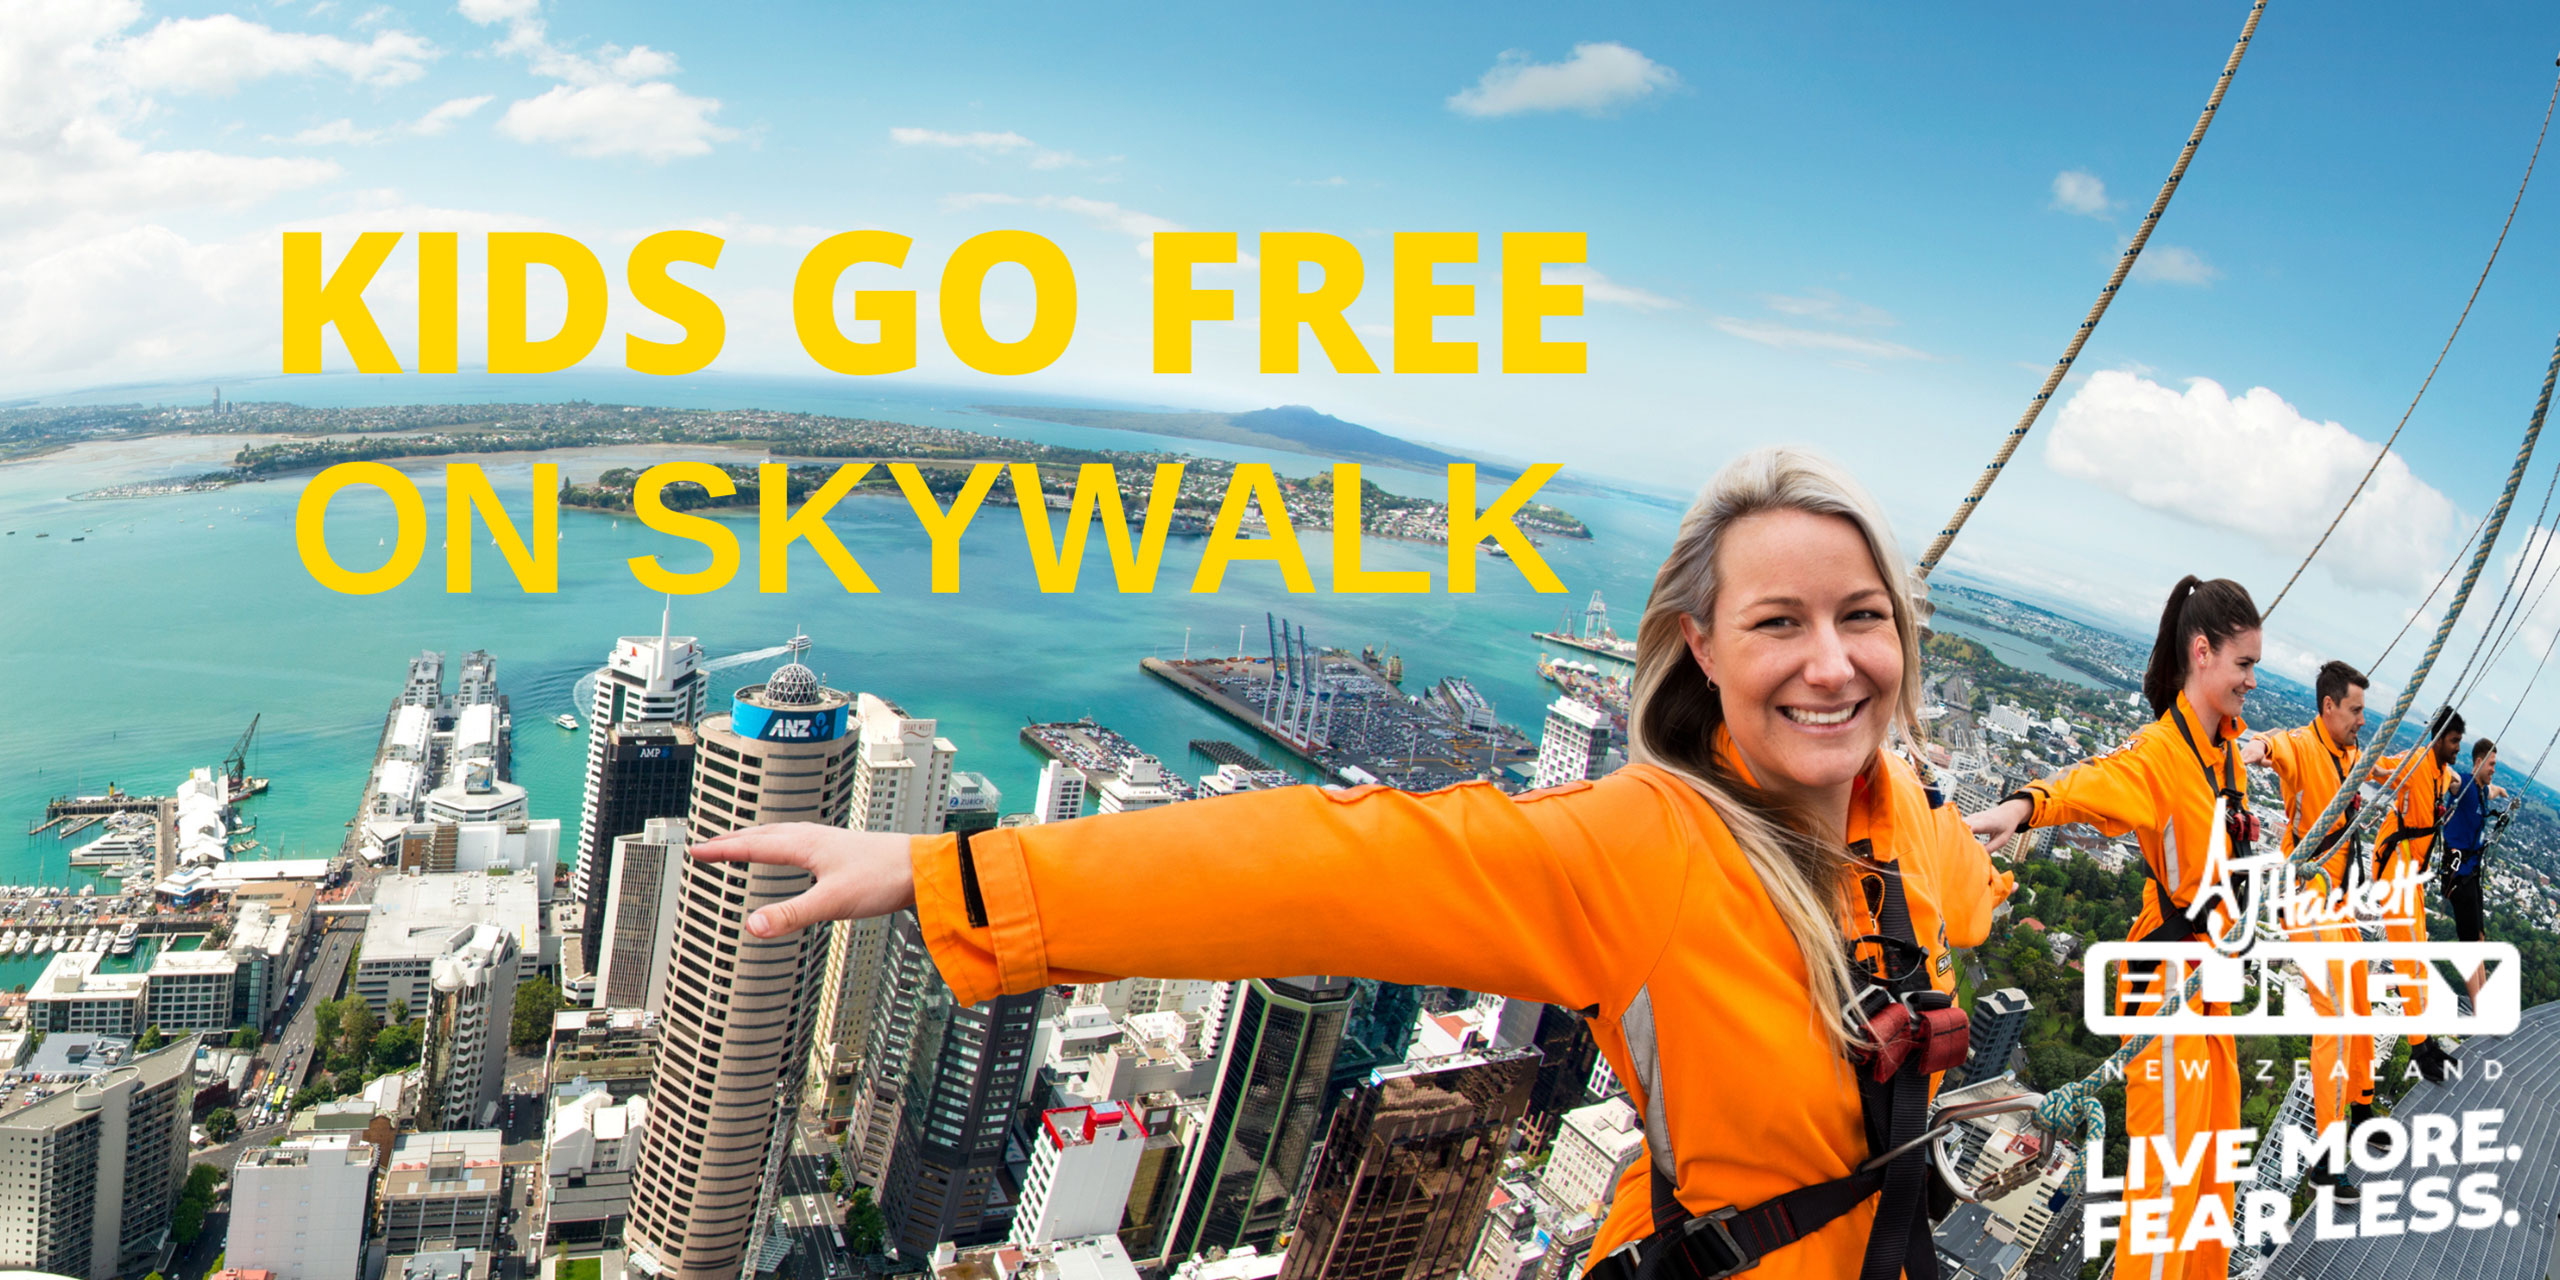 Kids go free on SKYWALK